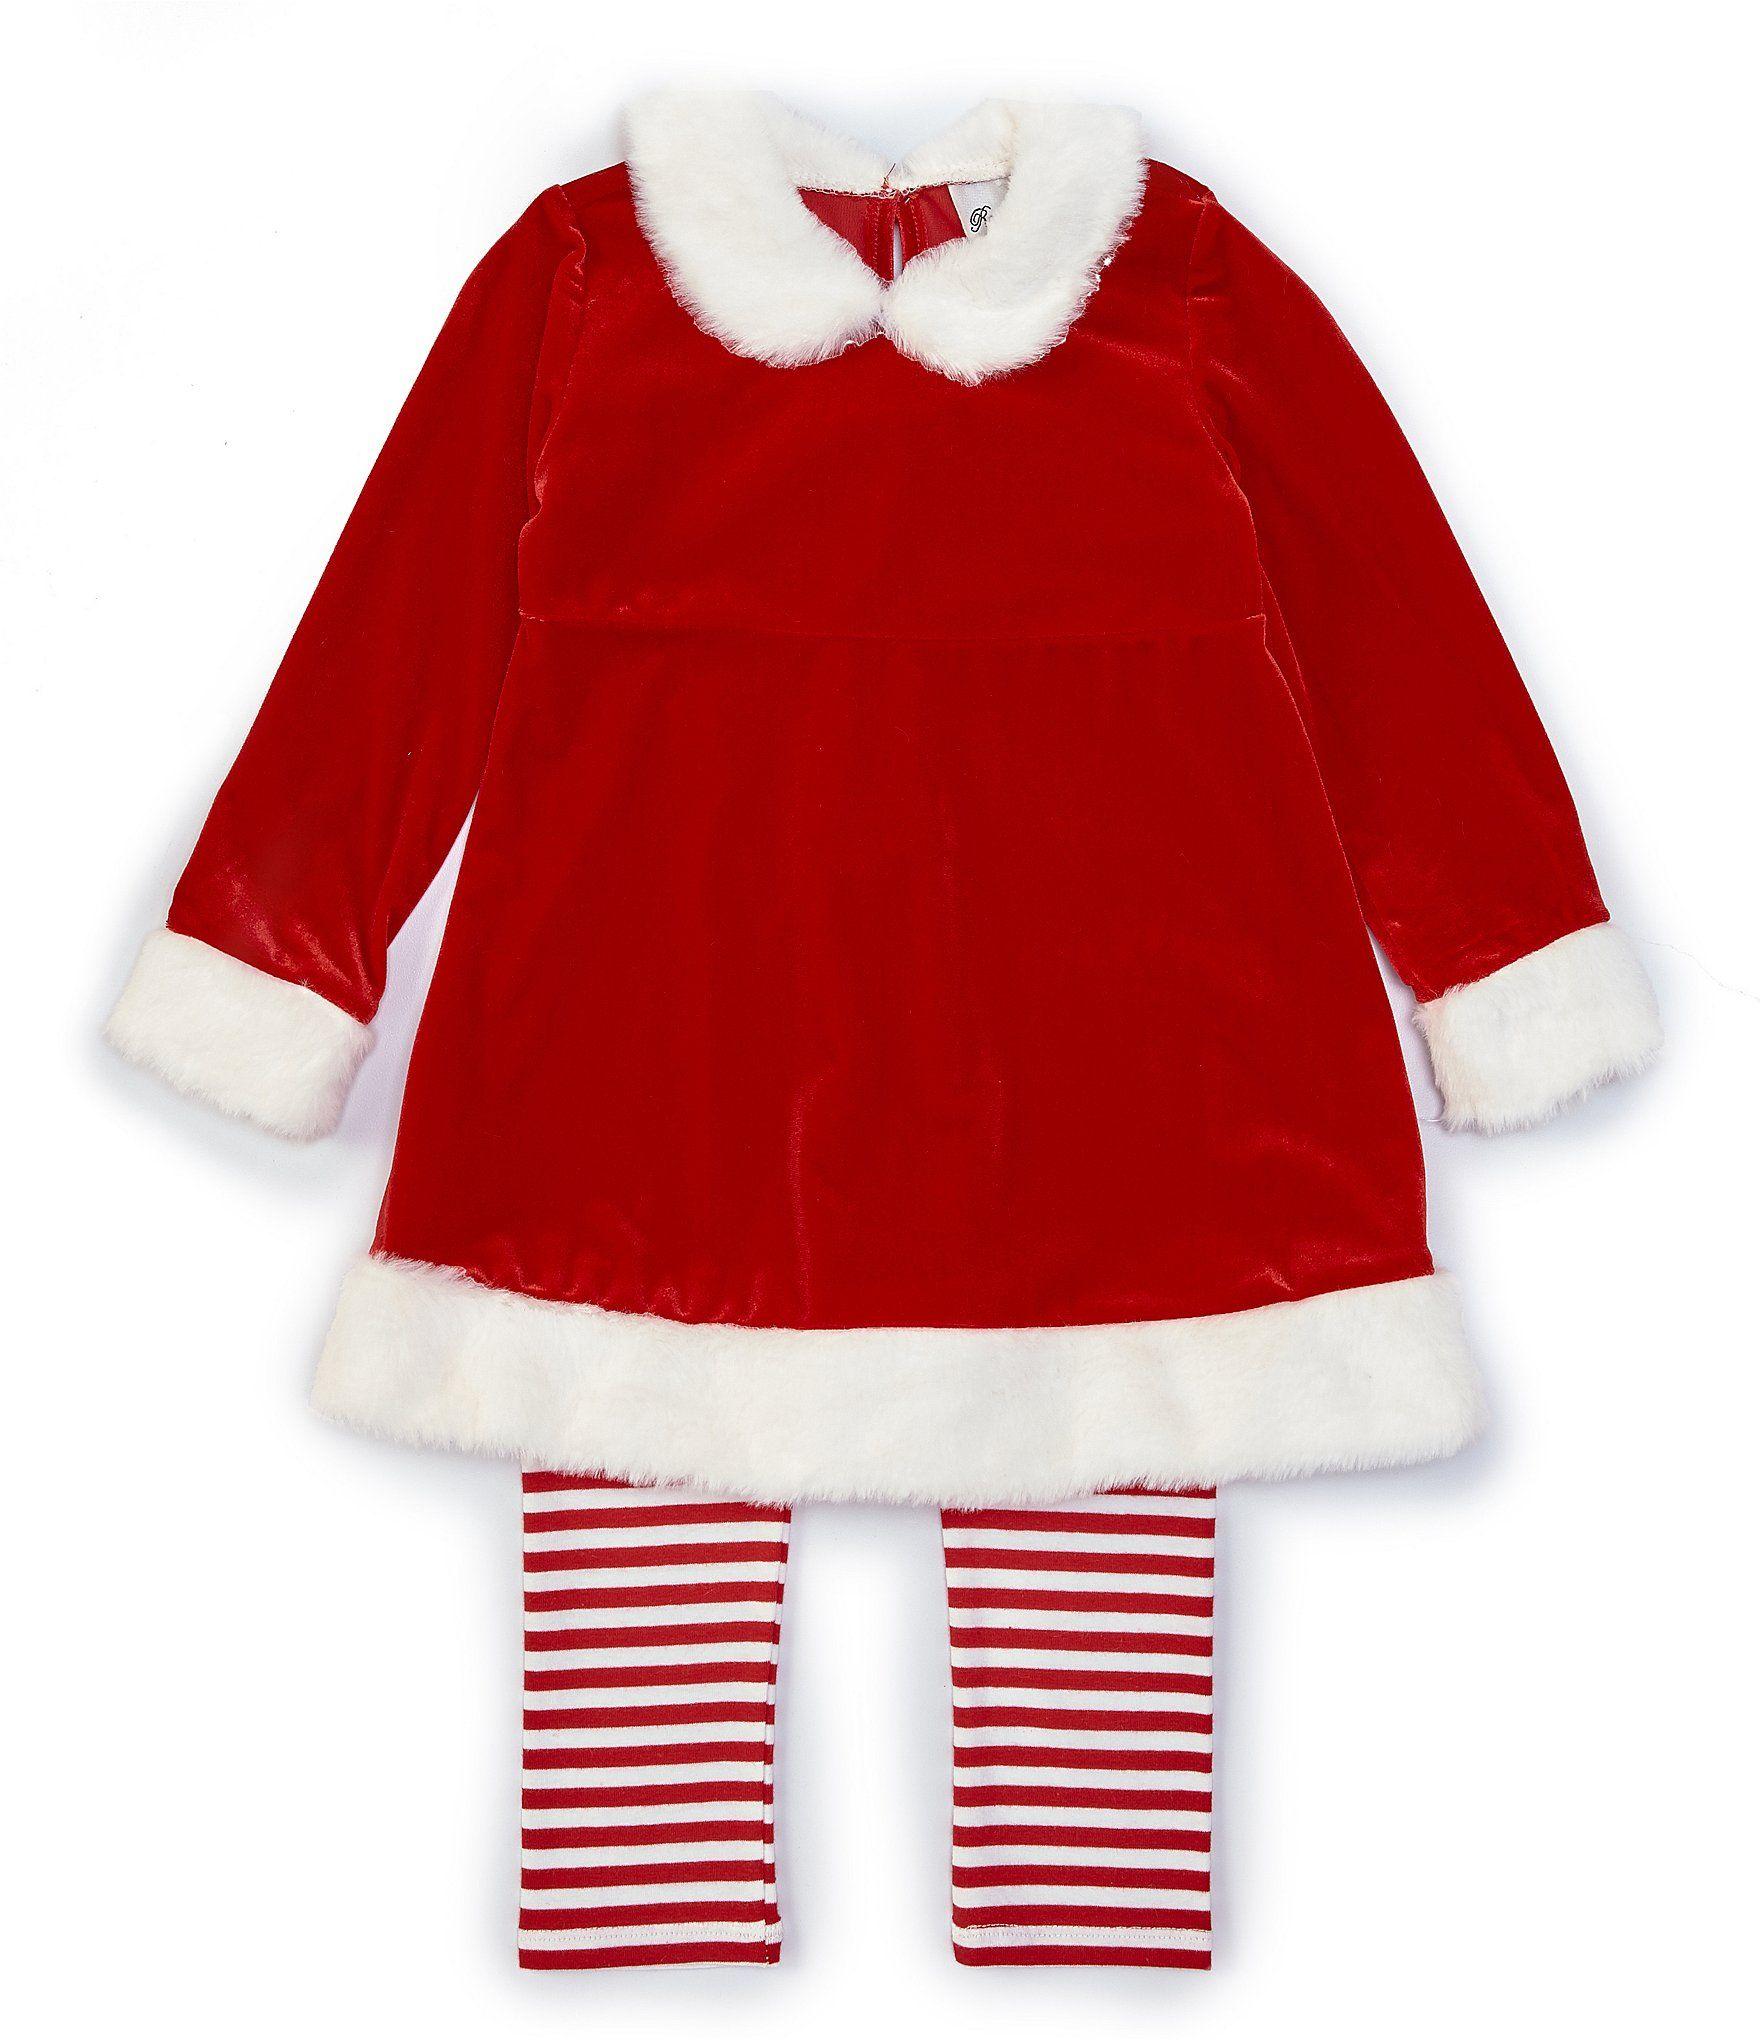 Rare Editions Little Girls Christmas Santa Clause Top  Striped Leggings Set - Red 6X #stripedleggings